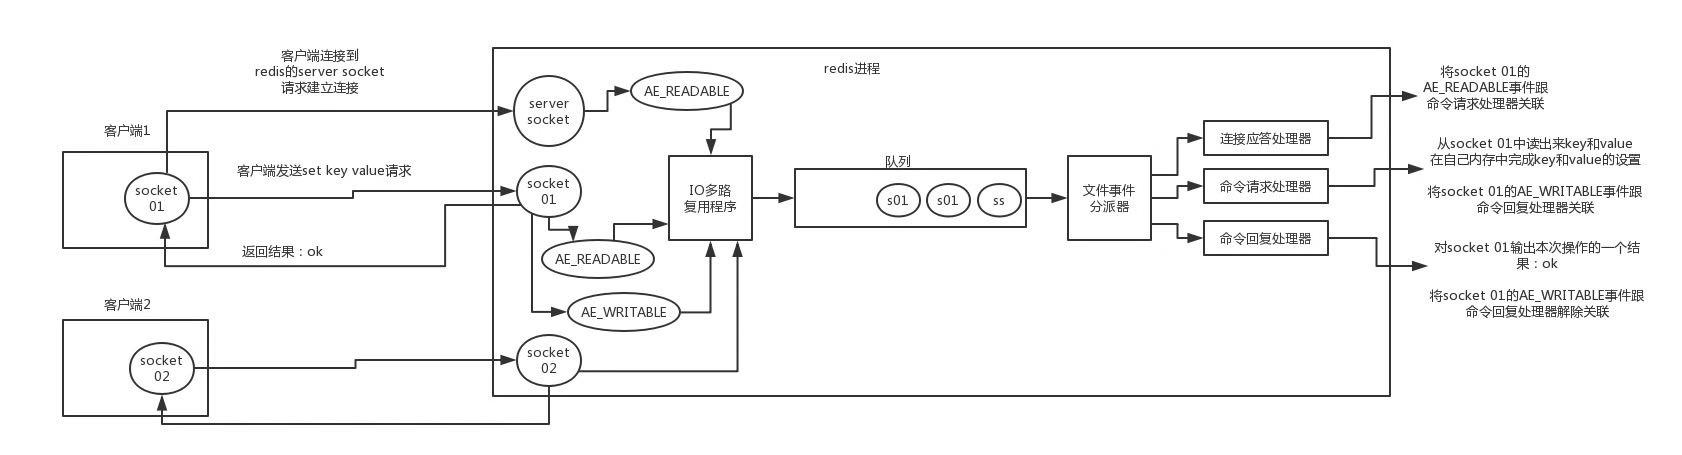 redis的线程模型